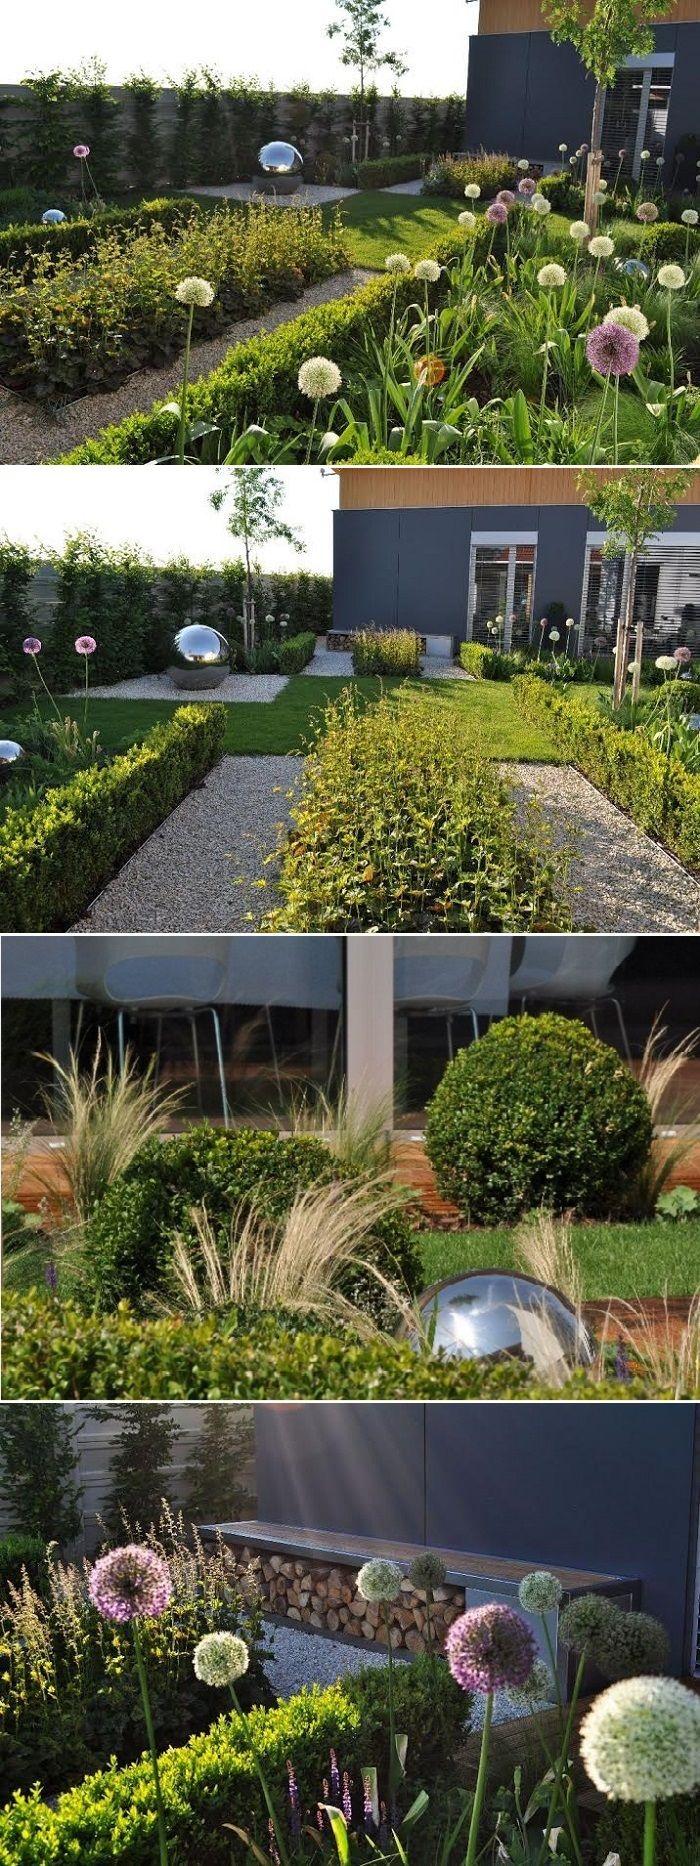 Grand Garden – The Beauty and Simplicity of Modern Landscaping Modern Garden Design in Matúškovo with garden area of 330 m2, built in 2011